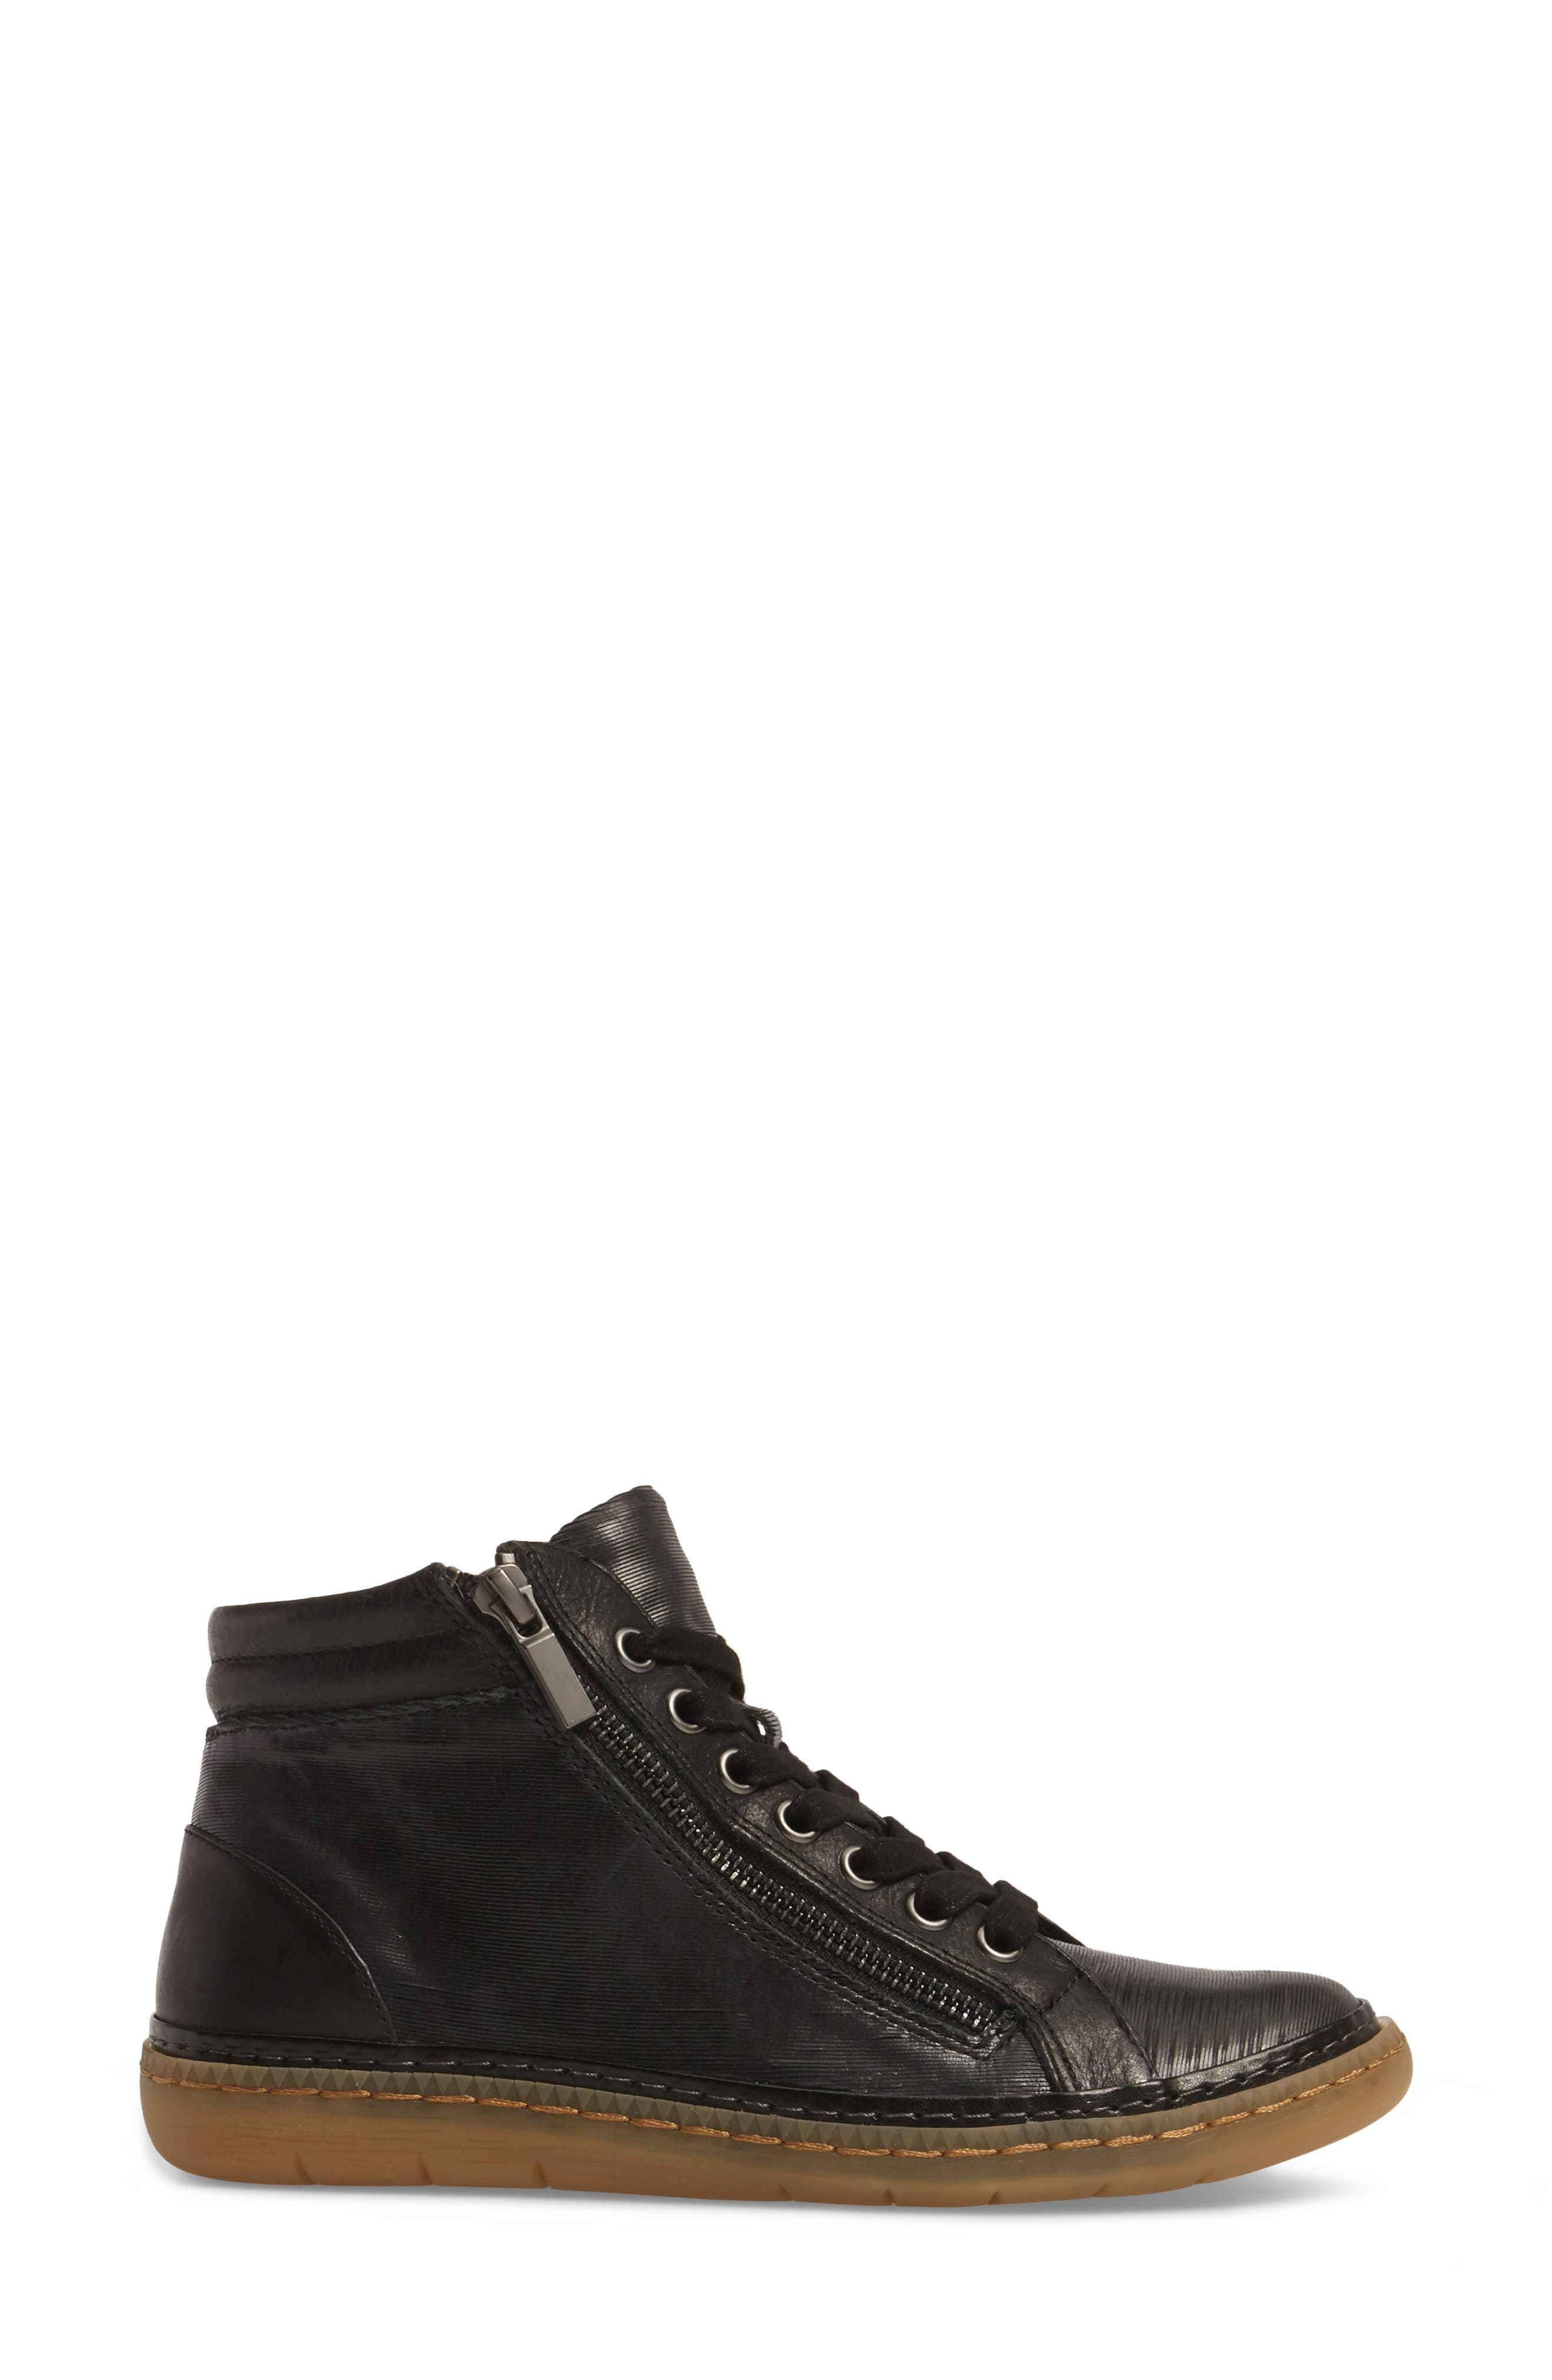 Annaleigh High Top Sneaker,                             Alternate thumbnail 3, color,                             001